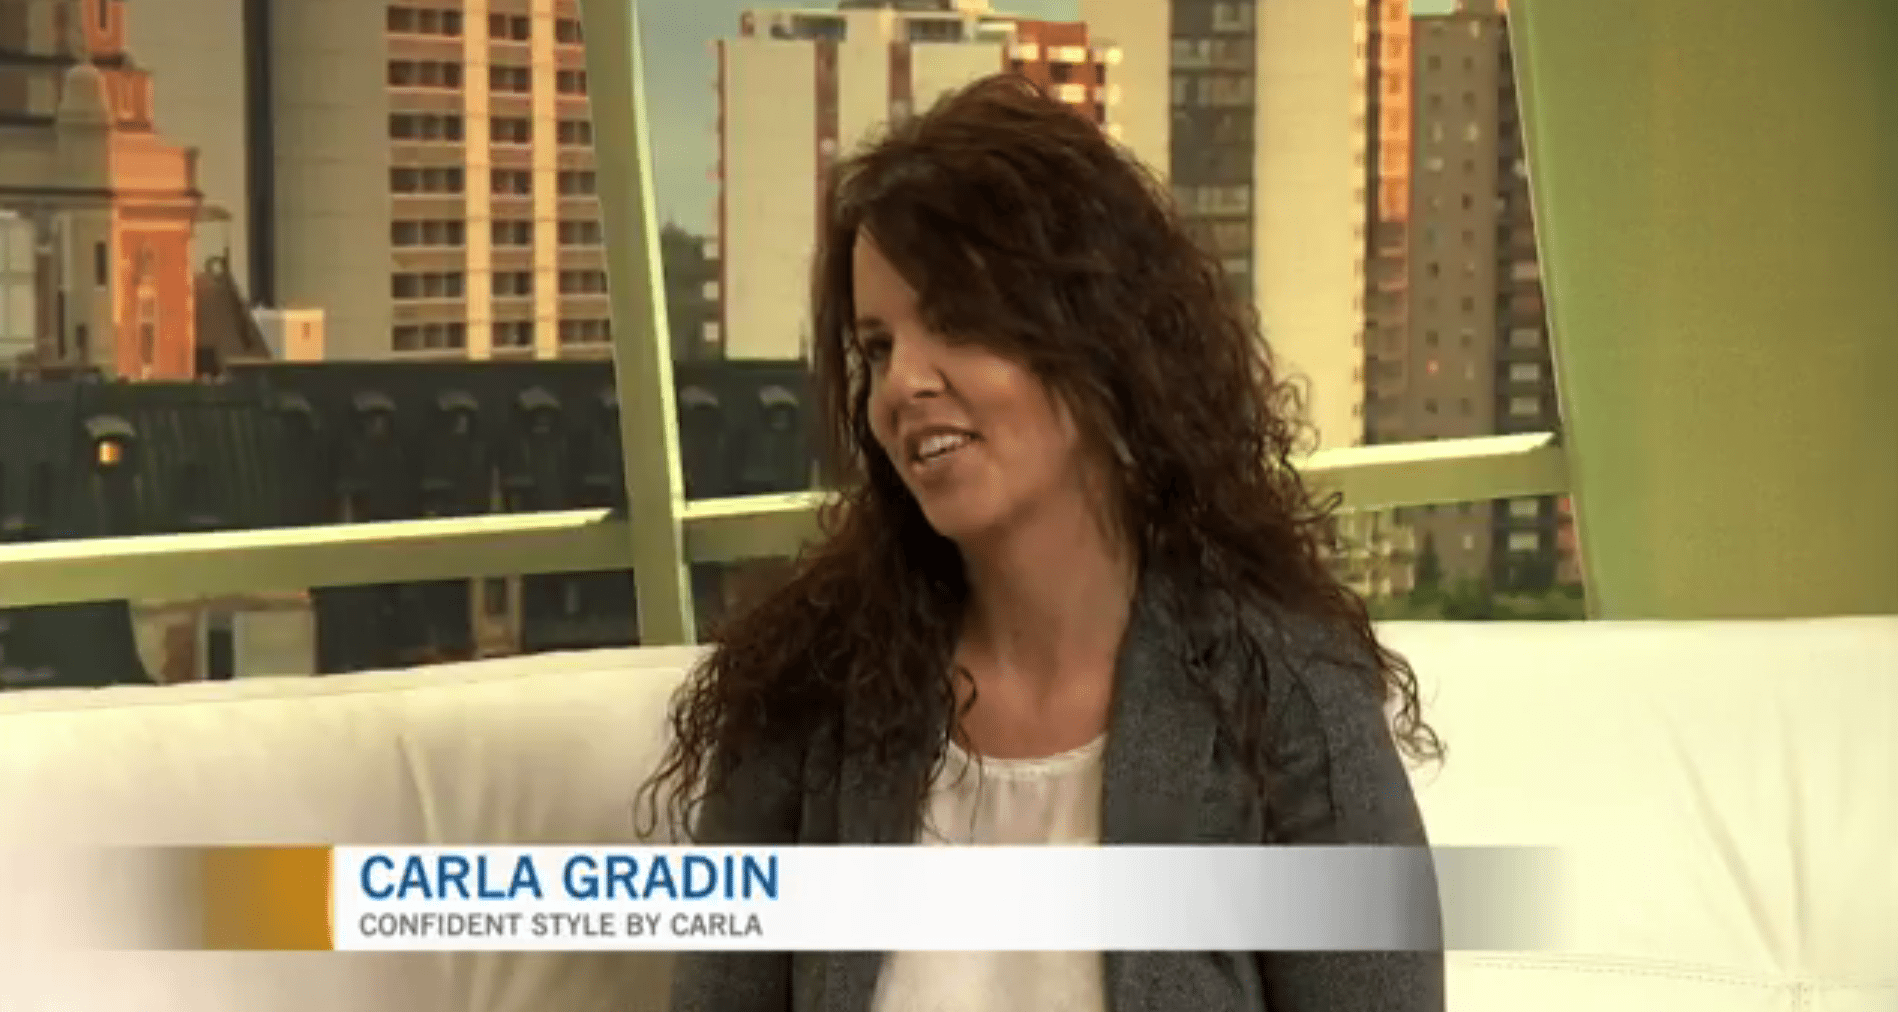 Carla Gradin